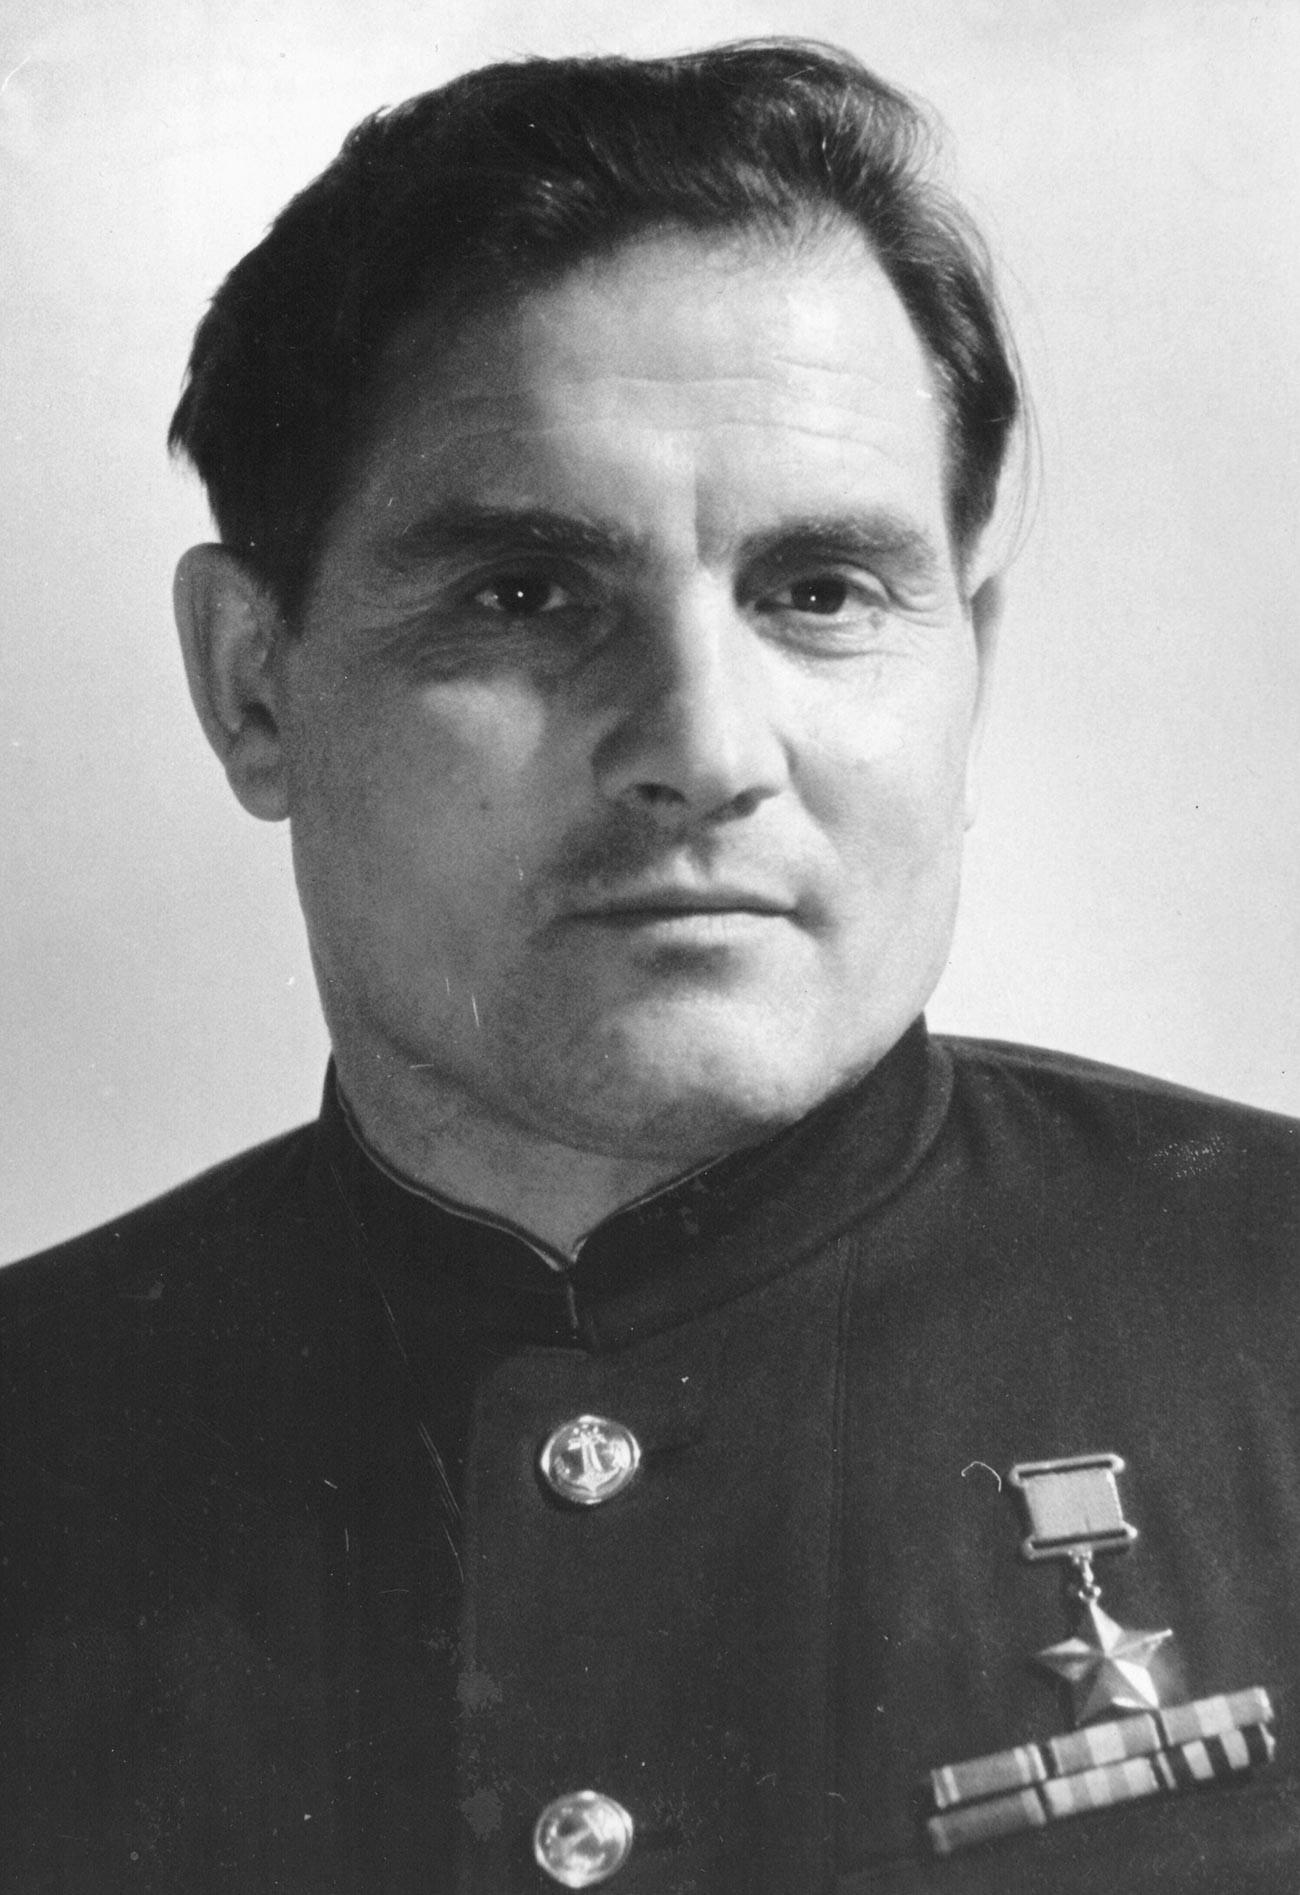 Mihail Petrovič Devjatajev, junak Sovjetske zveze